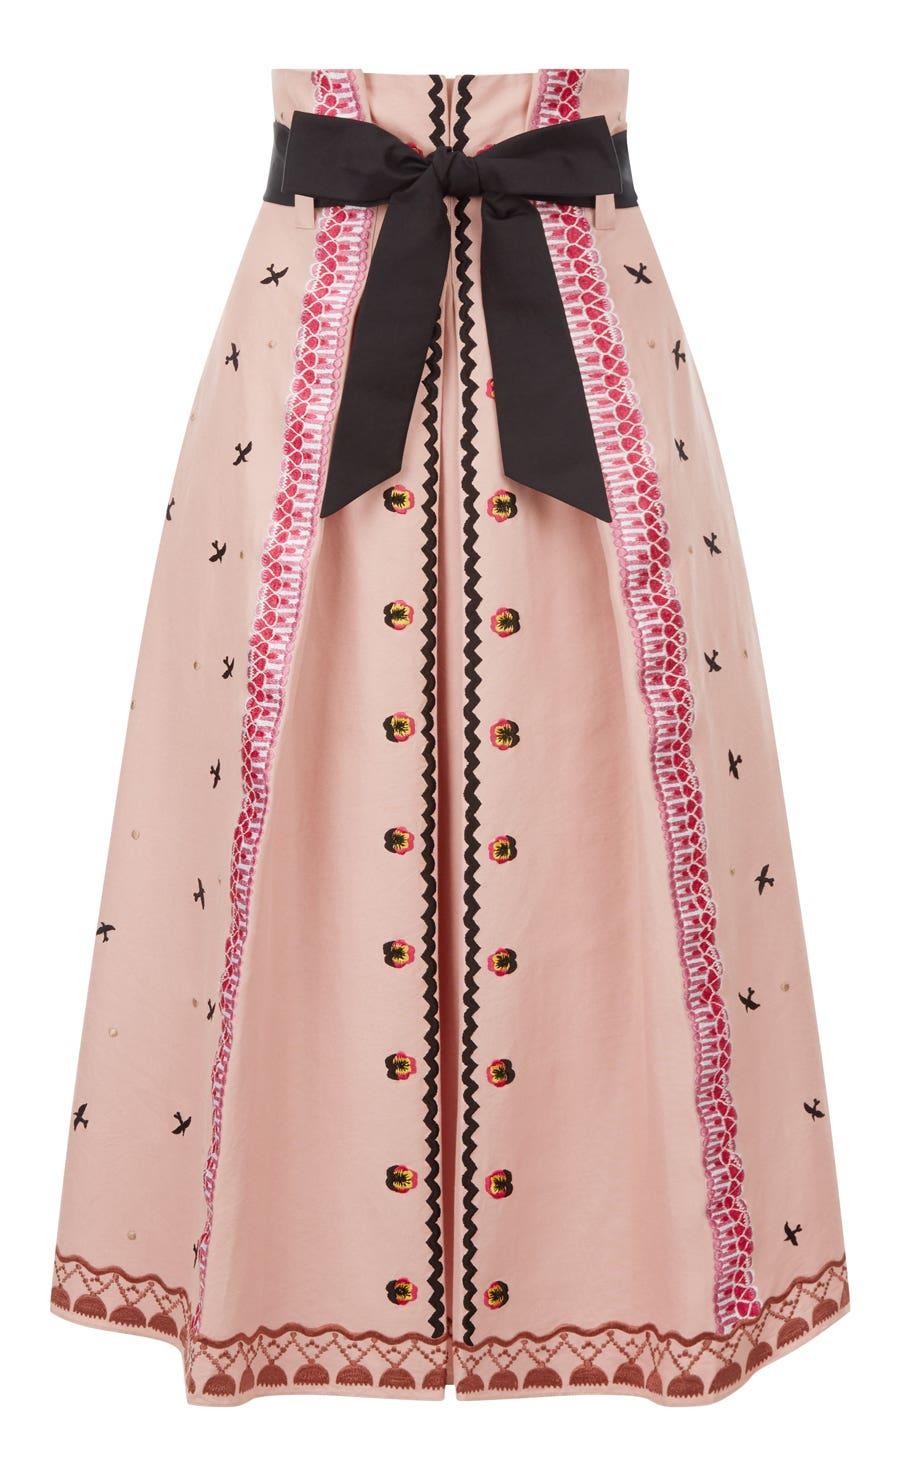 Poppy Field Skirt, Rose Mix